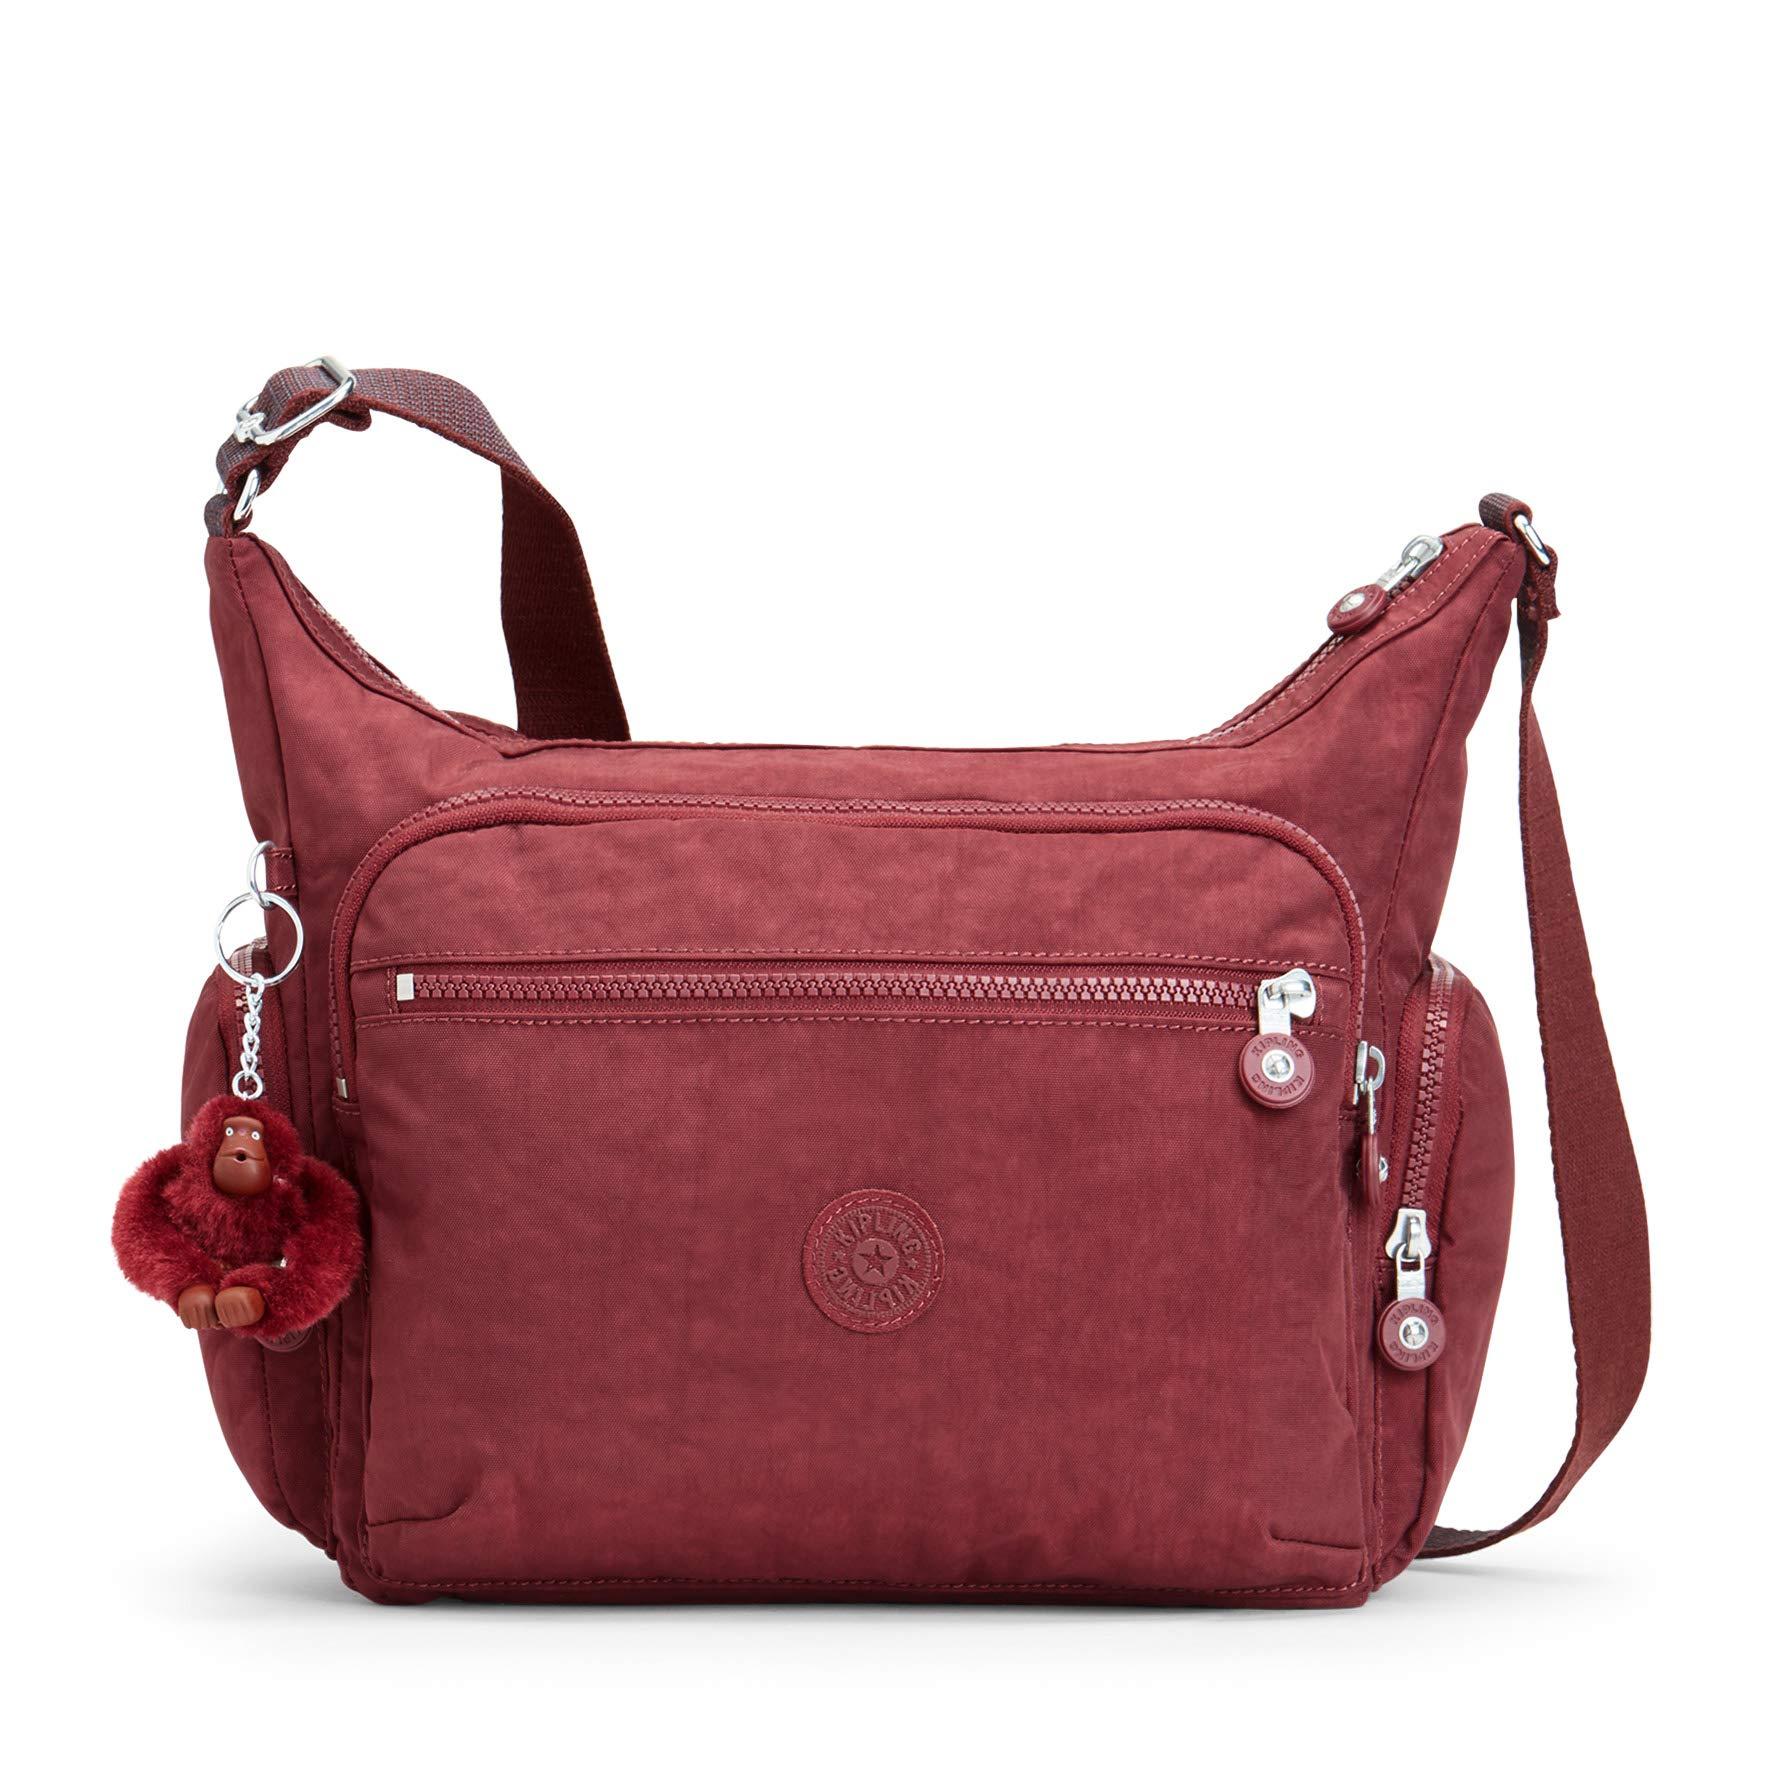 Kipling Tops Cotton Indigo Small Wallet//Cardholder BNWT